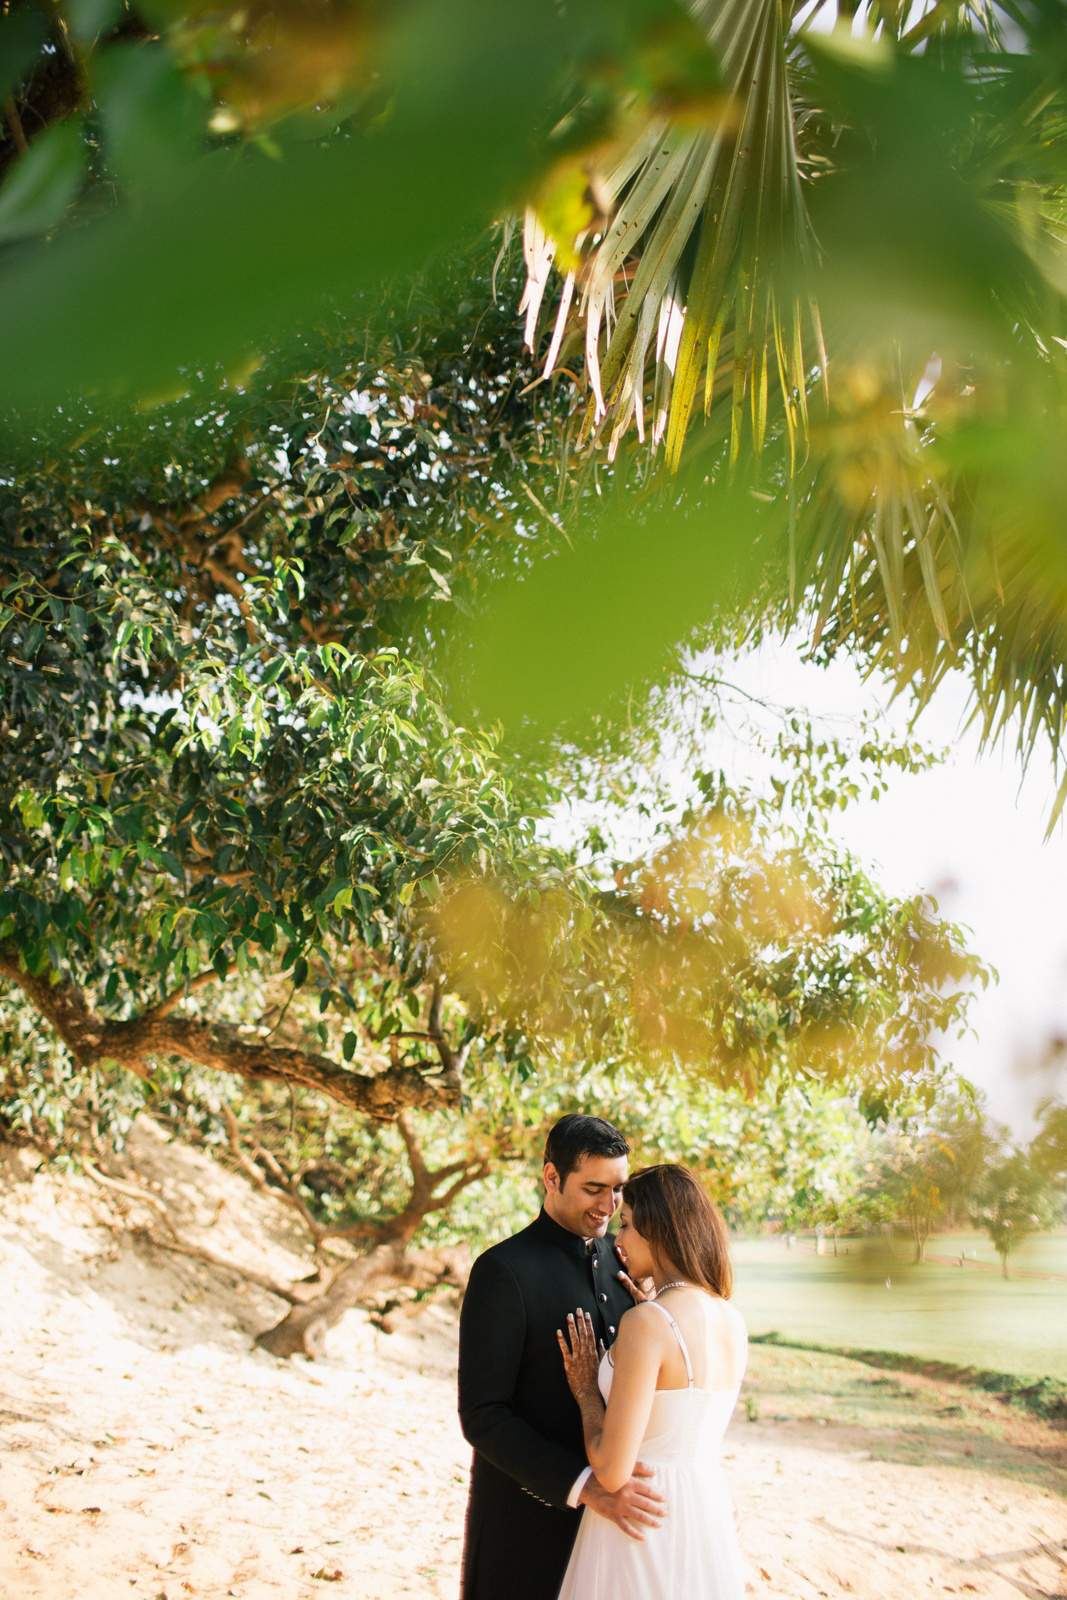 goa-beach-pre-wedding-couple-session-into-candid-photography-mk-27.jpg